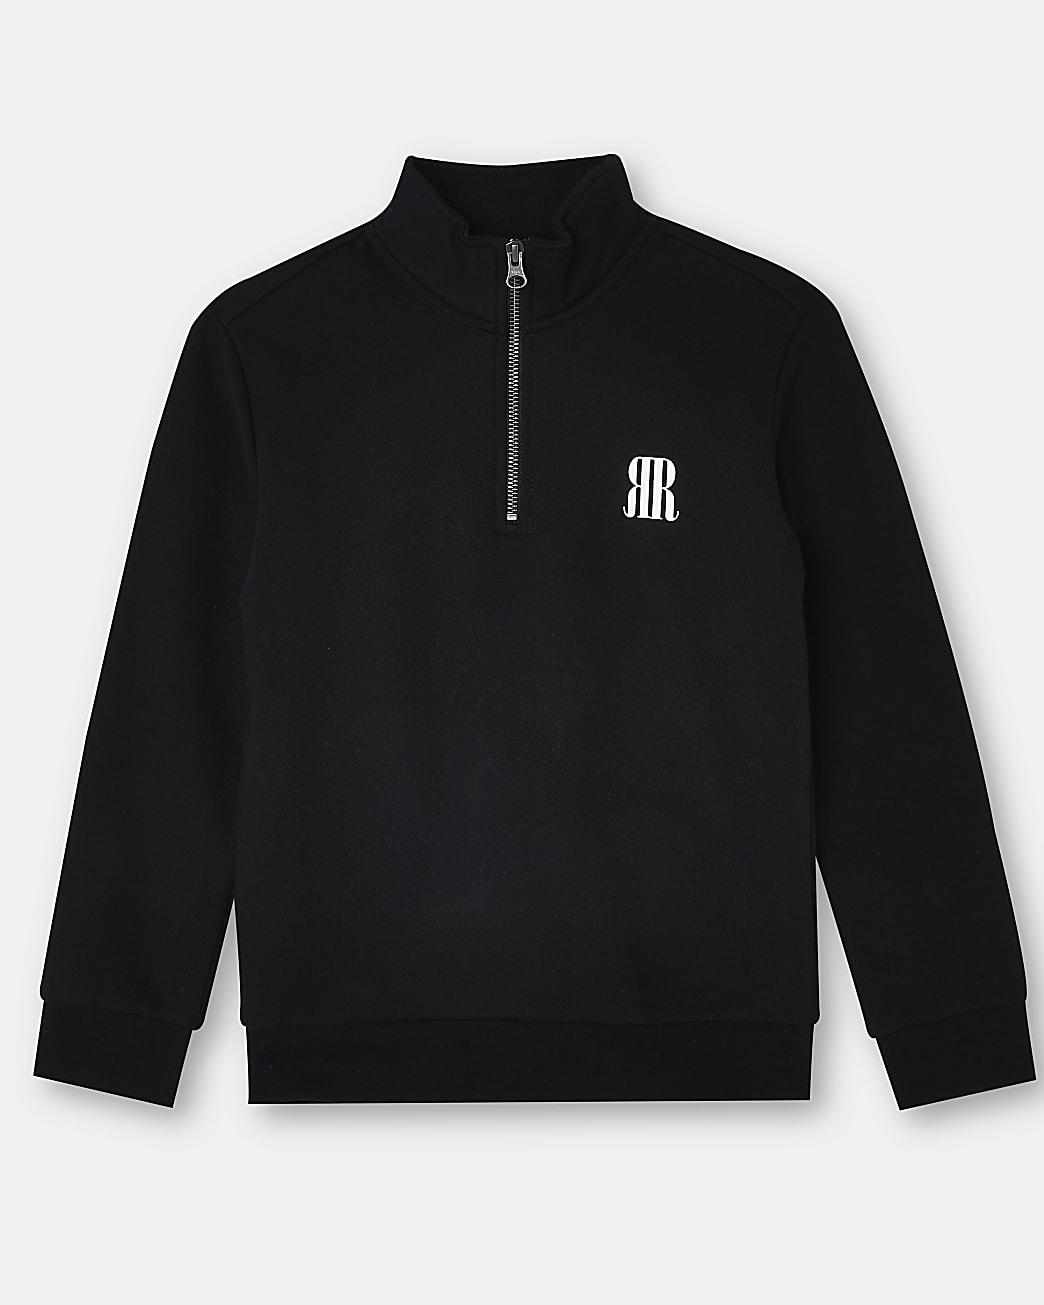 Boys black RR funnel neck sweatshirt